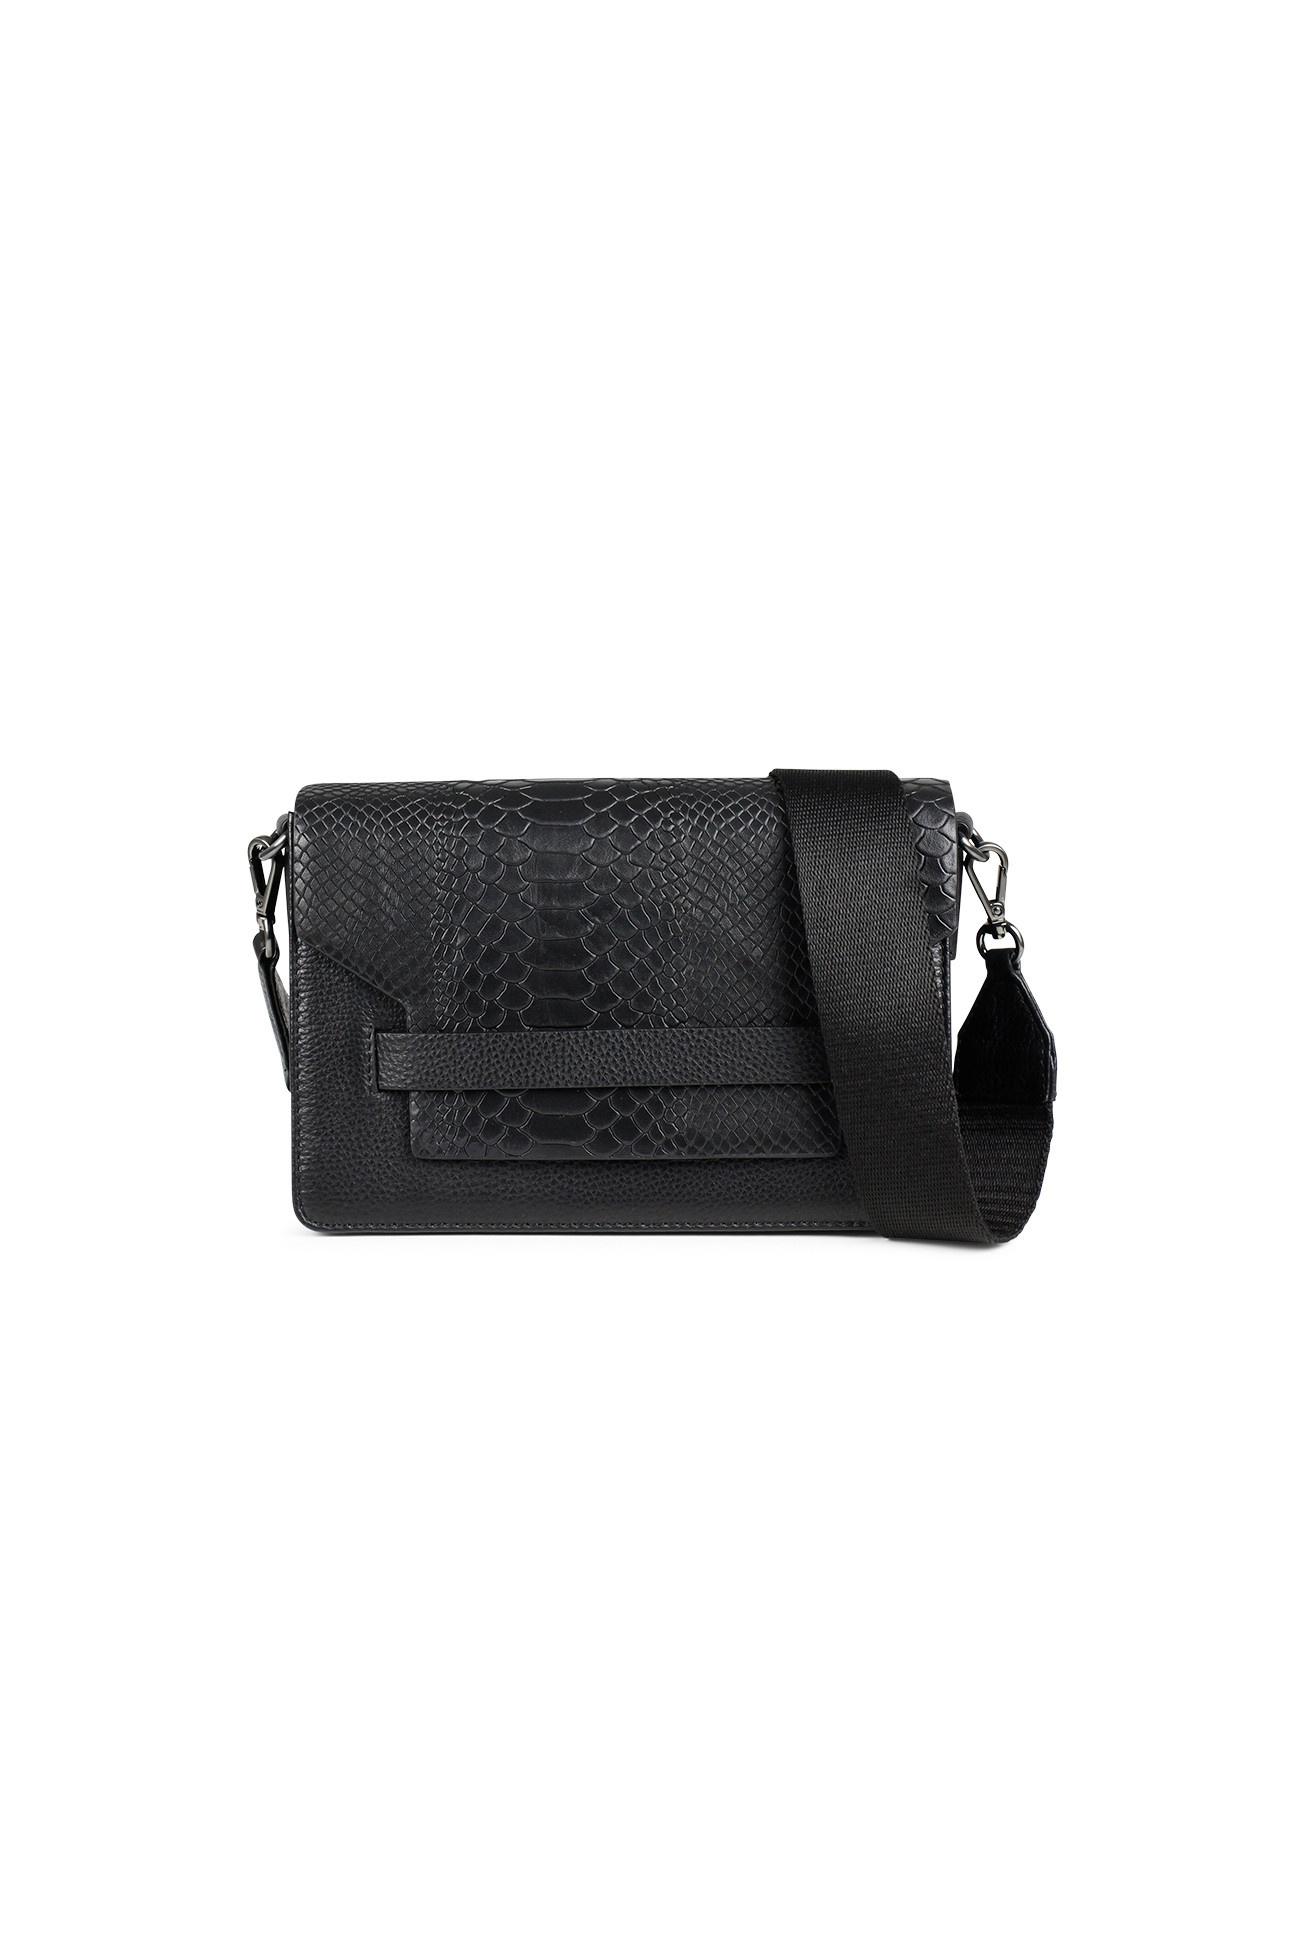 Arabella Crossbody Bag Snake - Black w/ Black-4